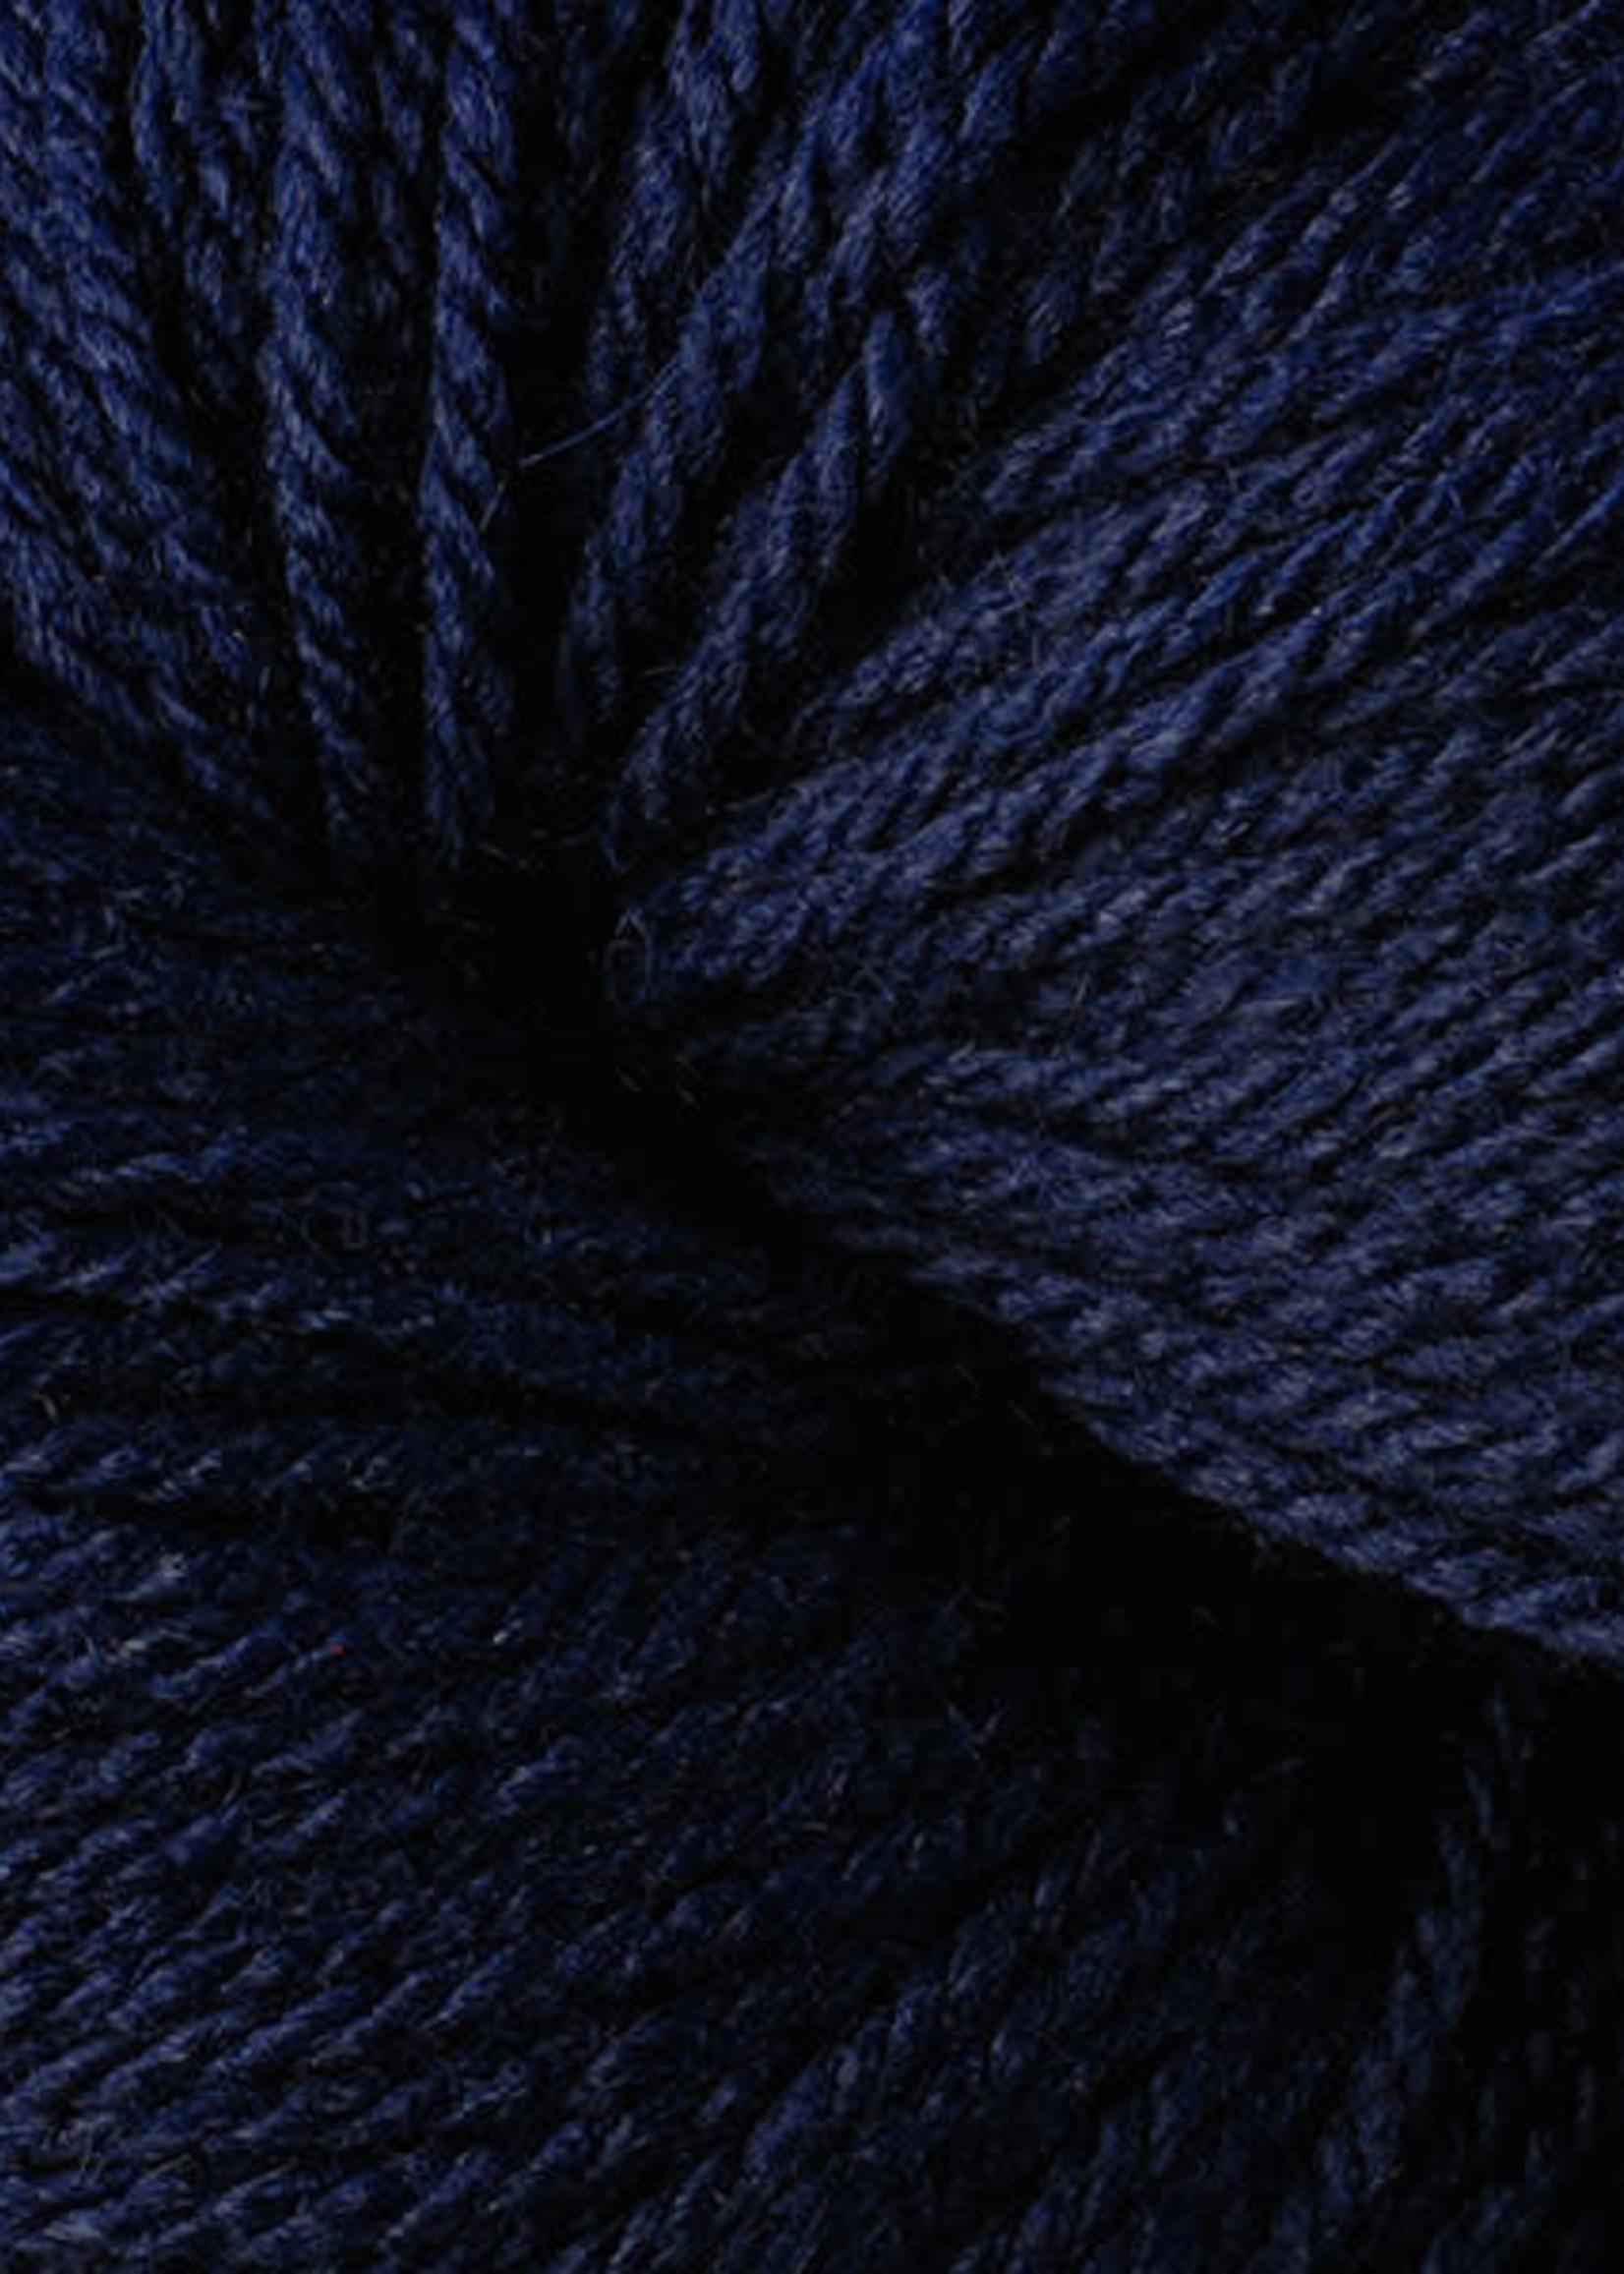 Berroco Berroco Vintage DK Yarn #2143 Dark Denim